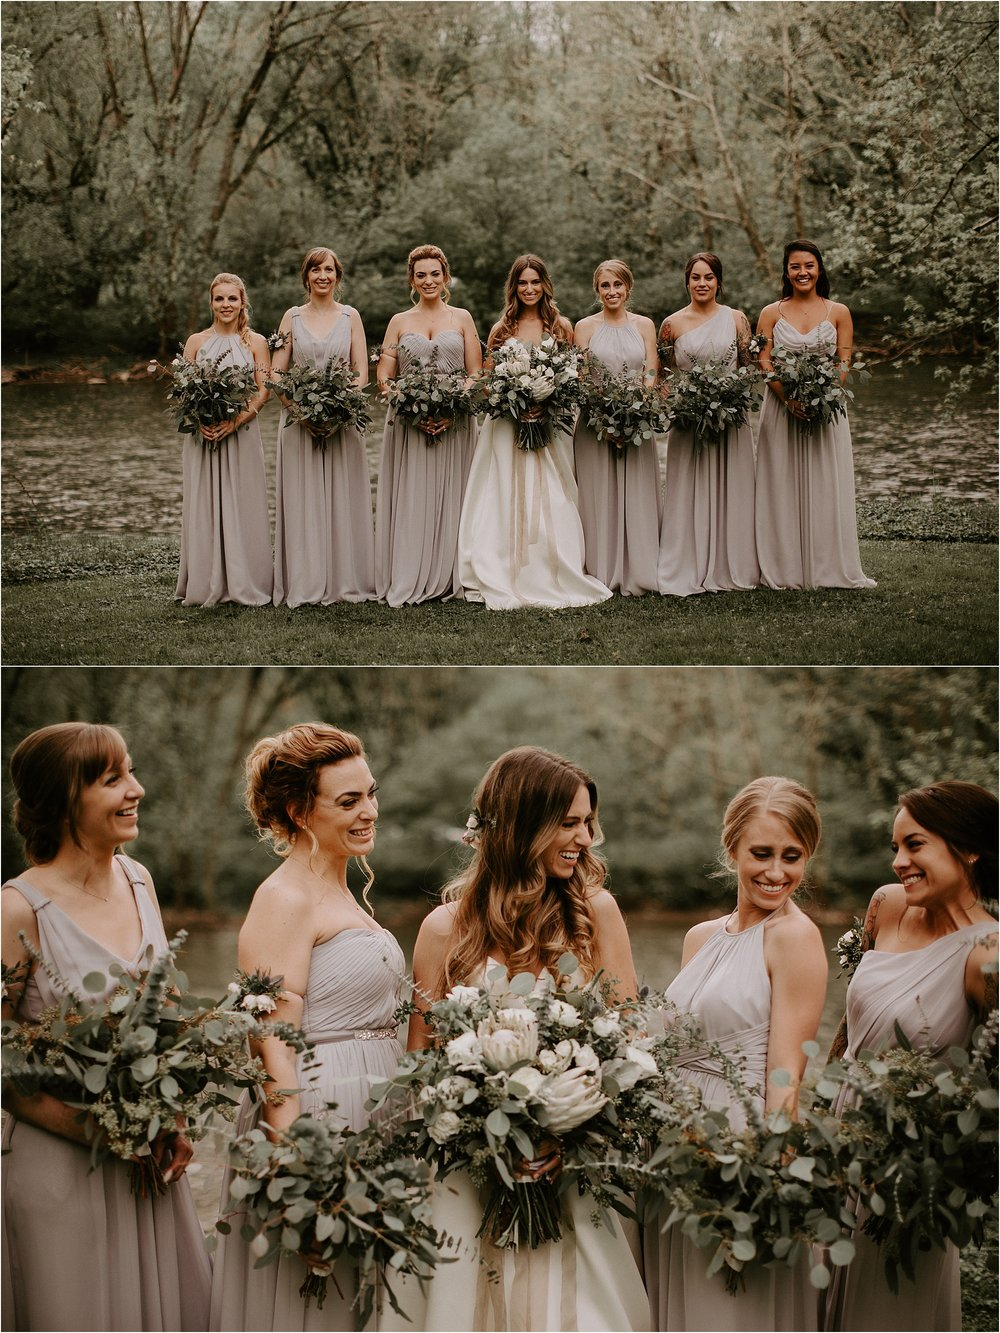 Sarah_Brookhart_Lancaster_PA_Wedding_Photographer_0043.jpg